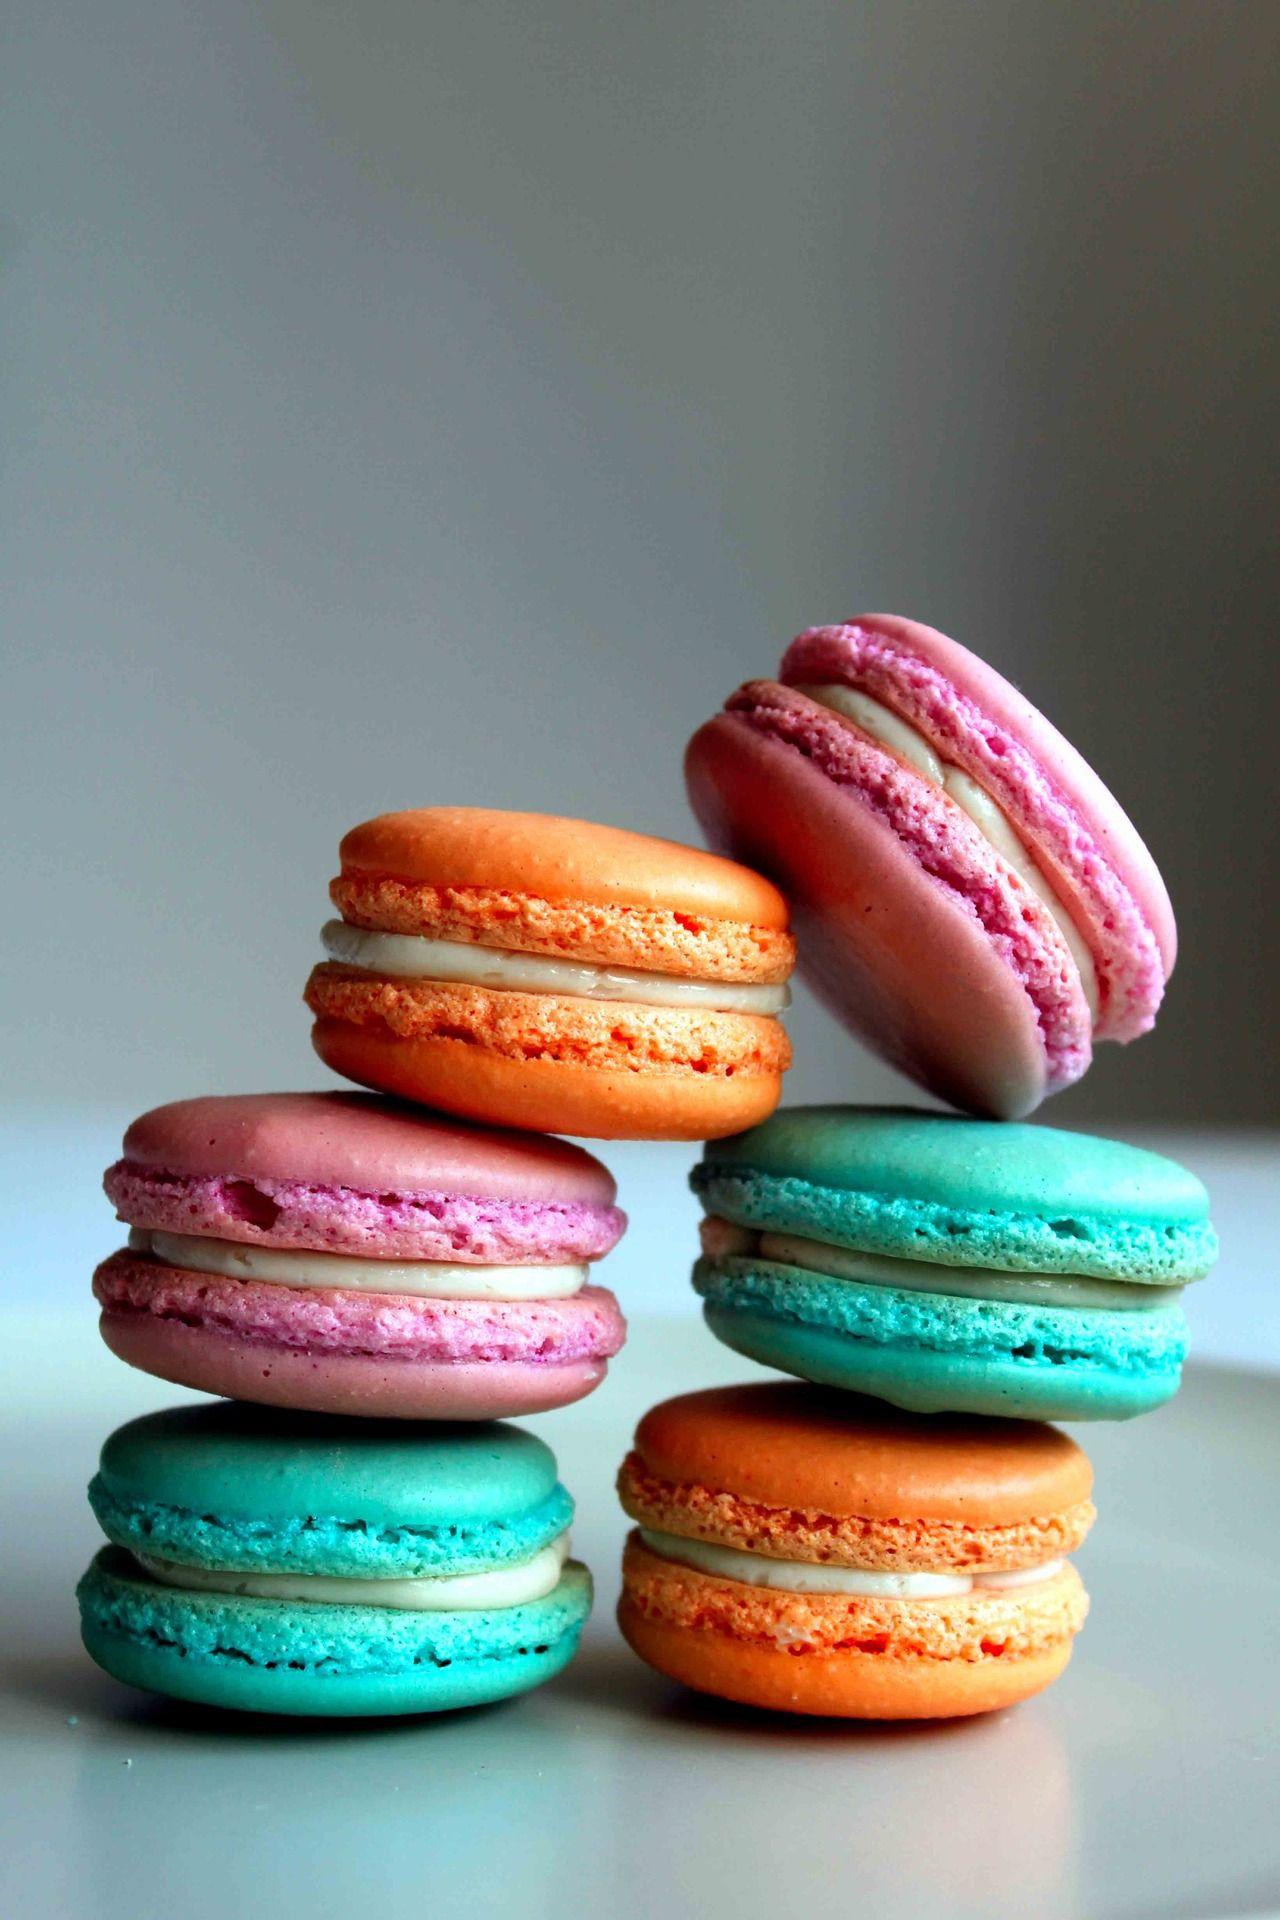 macarons  Recette patisserie, Macaron ladurée, Macaron